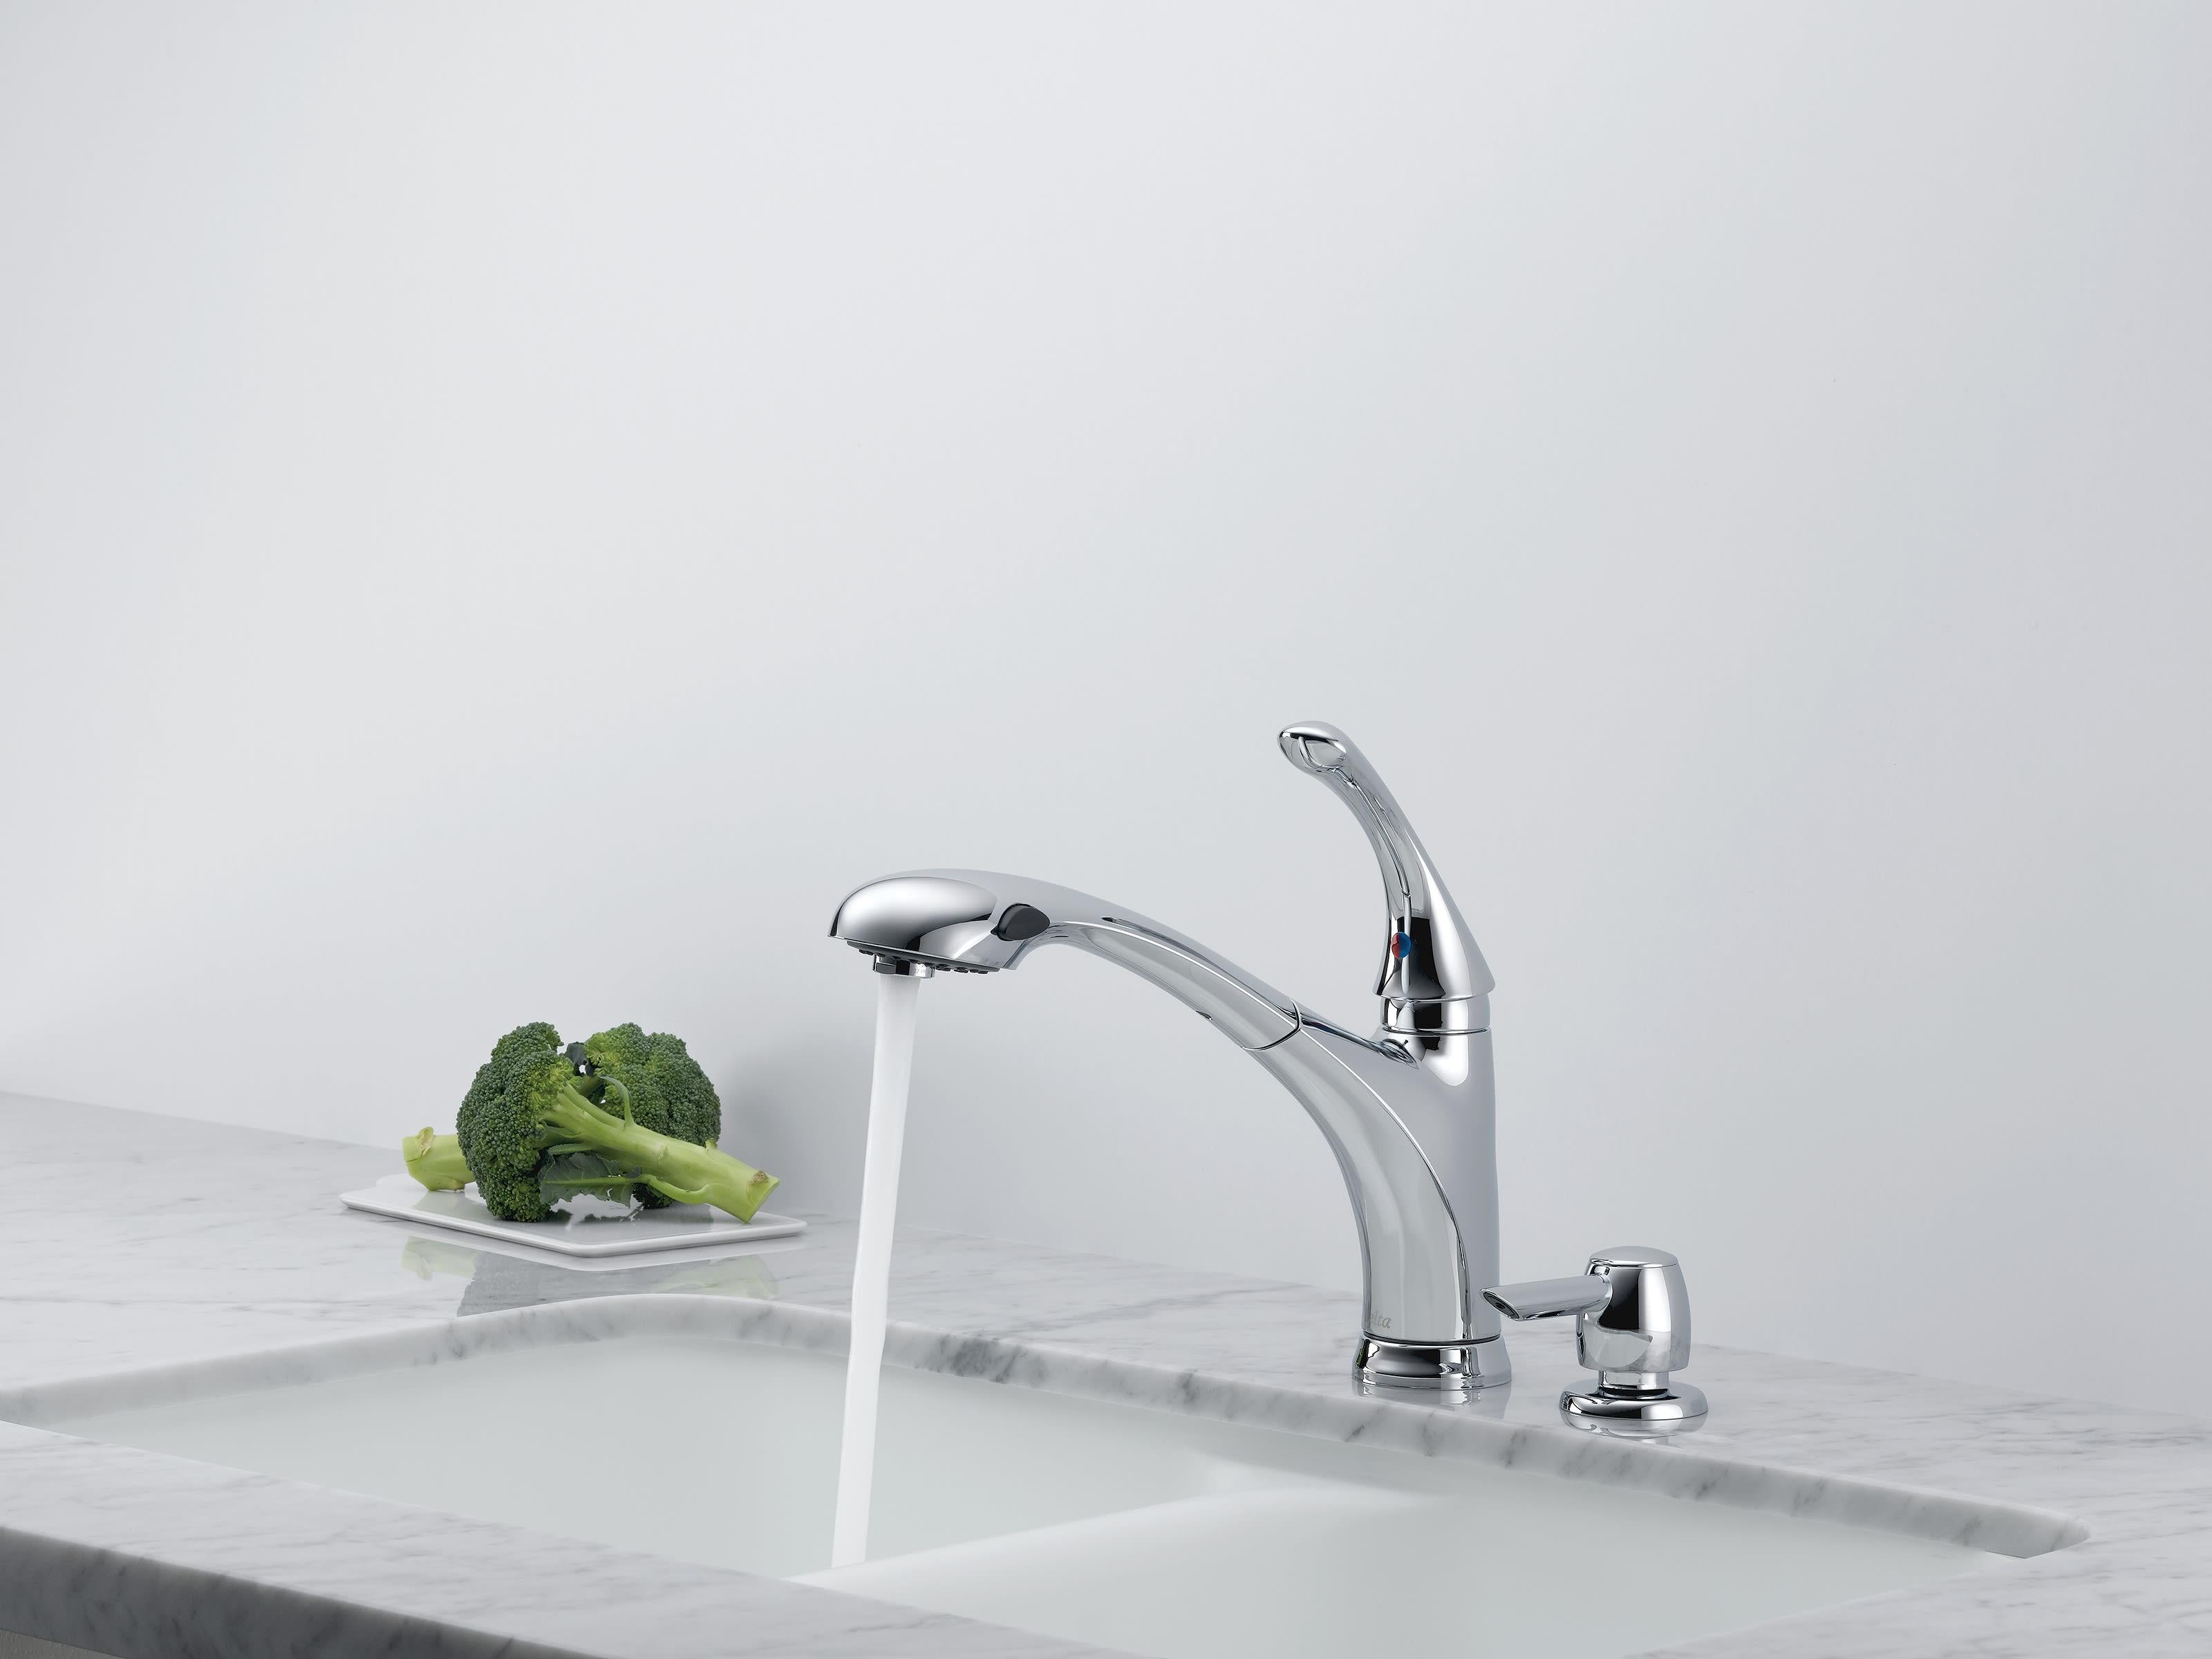 Delta 16927 Sd Dst Chrome Debonair Pullout Spray Kitchen Faucet With Diamond Seal Technology Includes Soap Dispenser Faucet Com